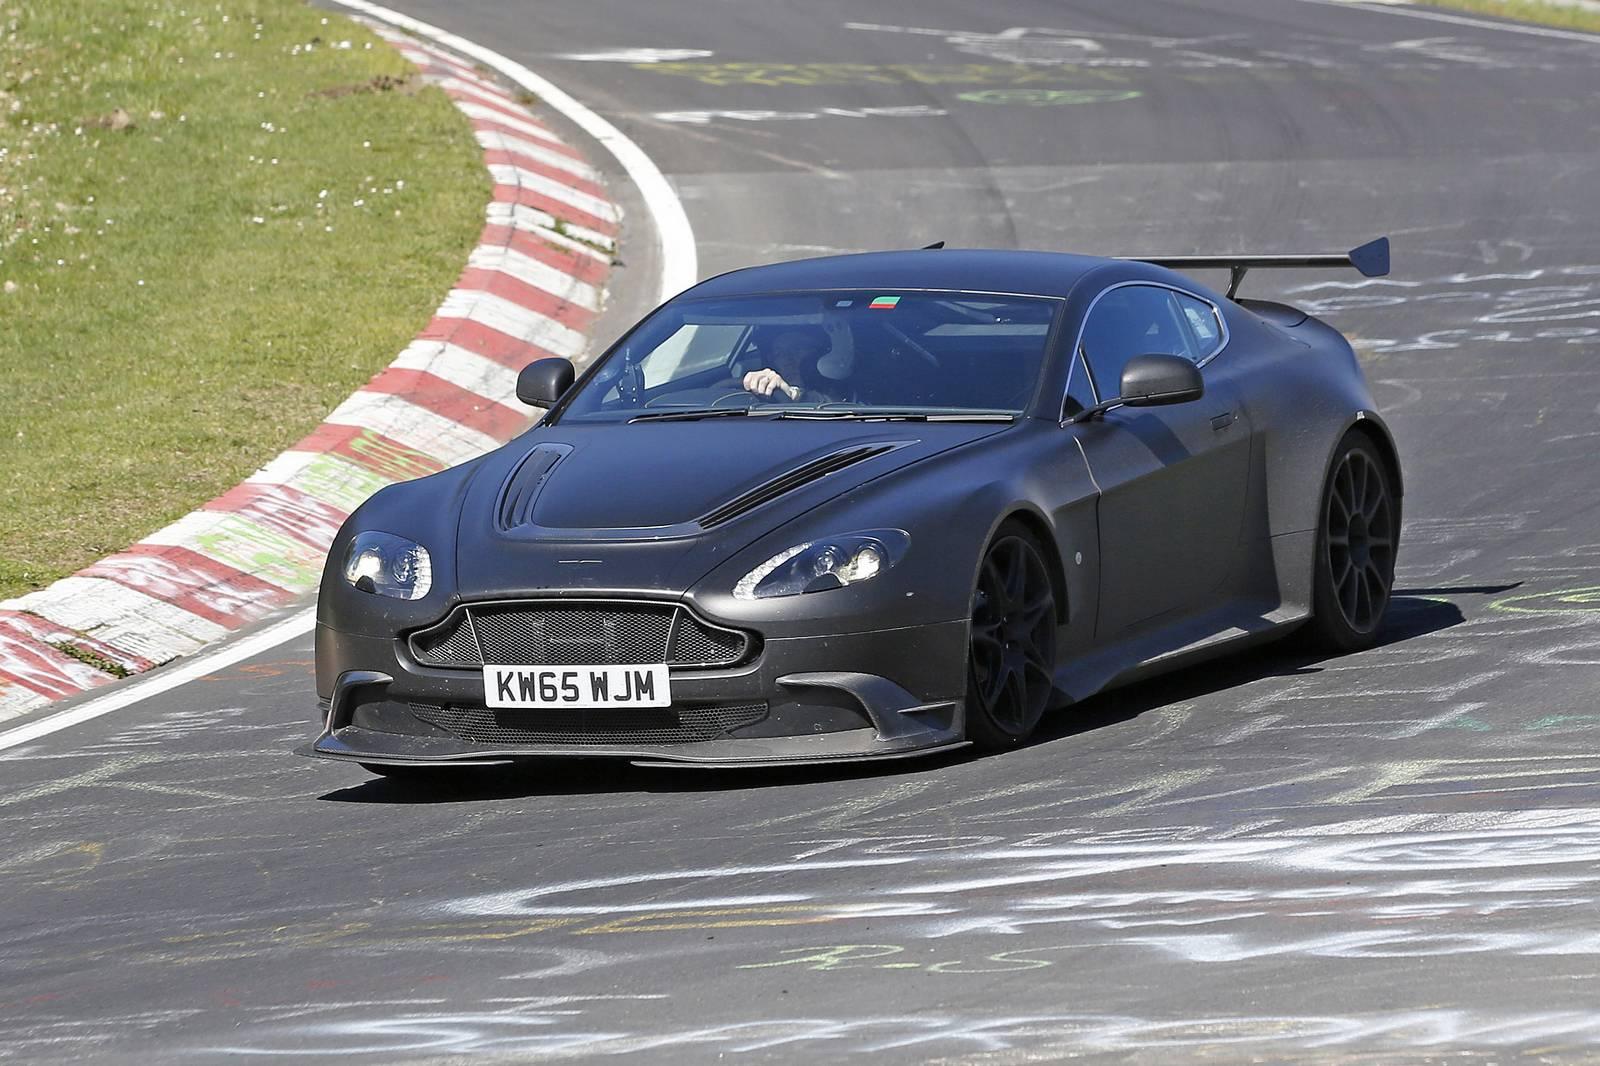 Aston Martin Vantage Gt8 New Spy Shots Gtspirit